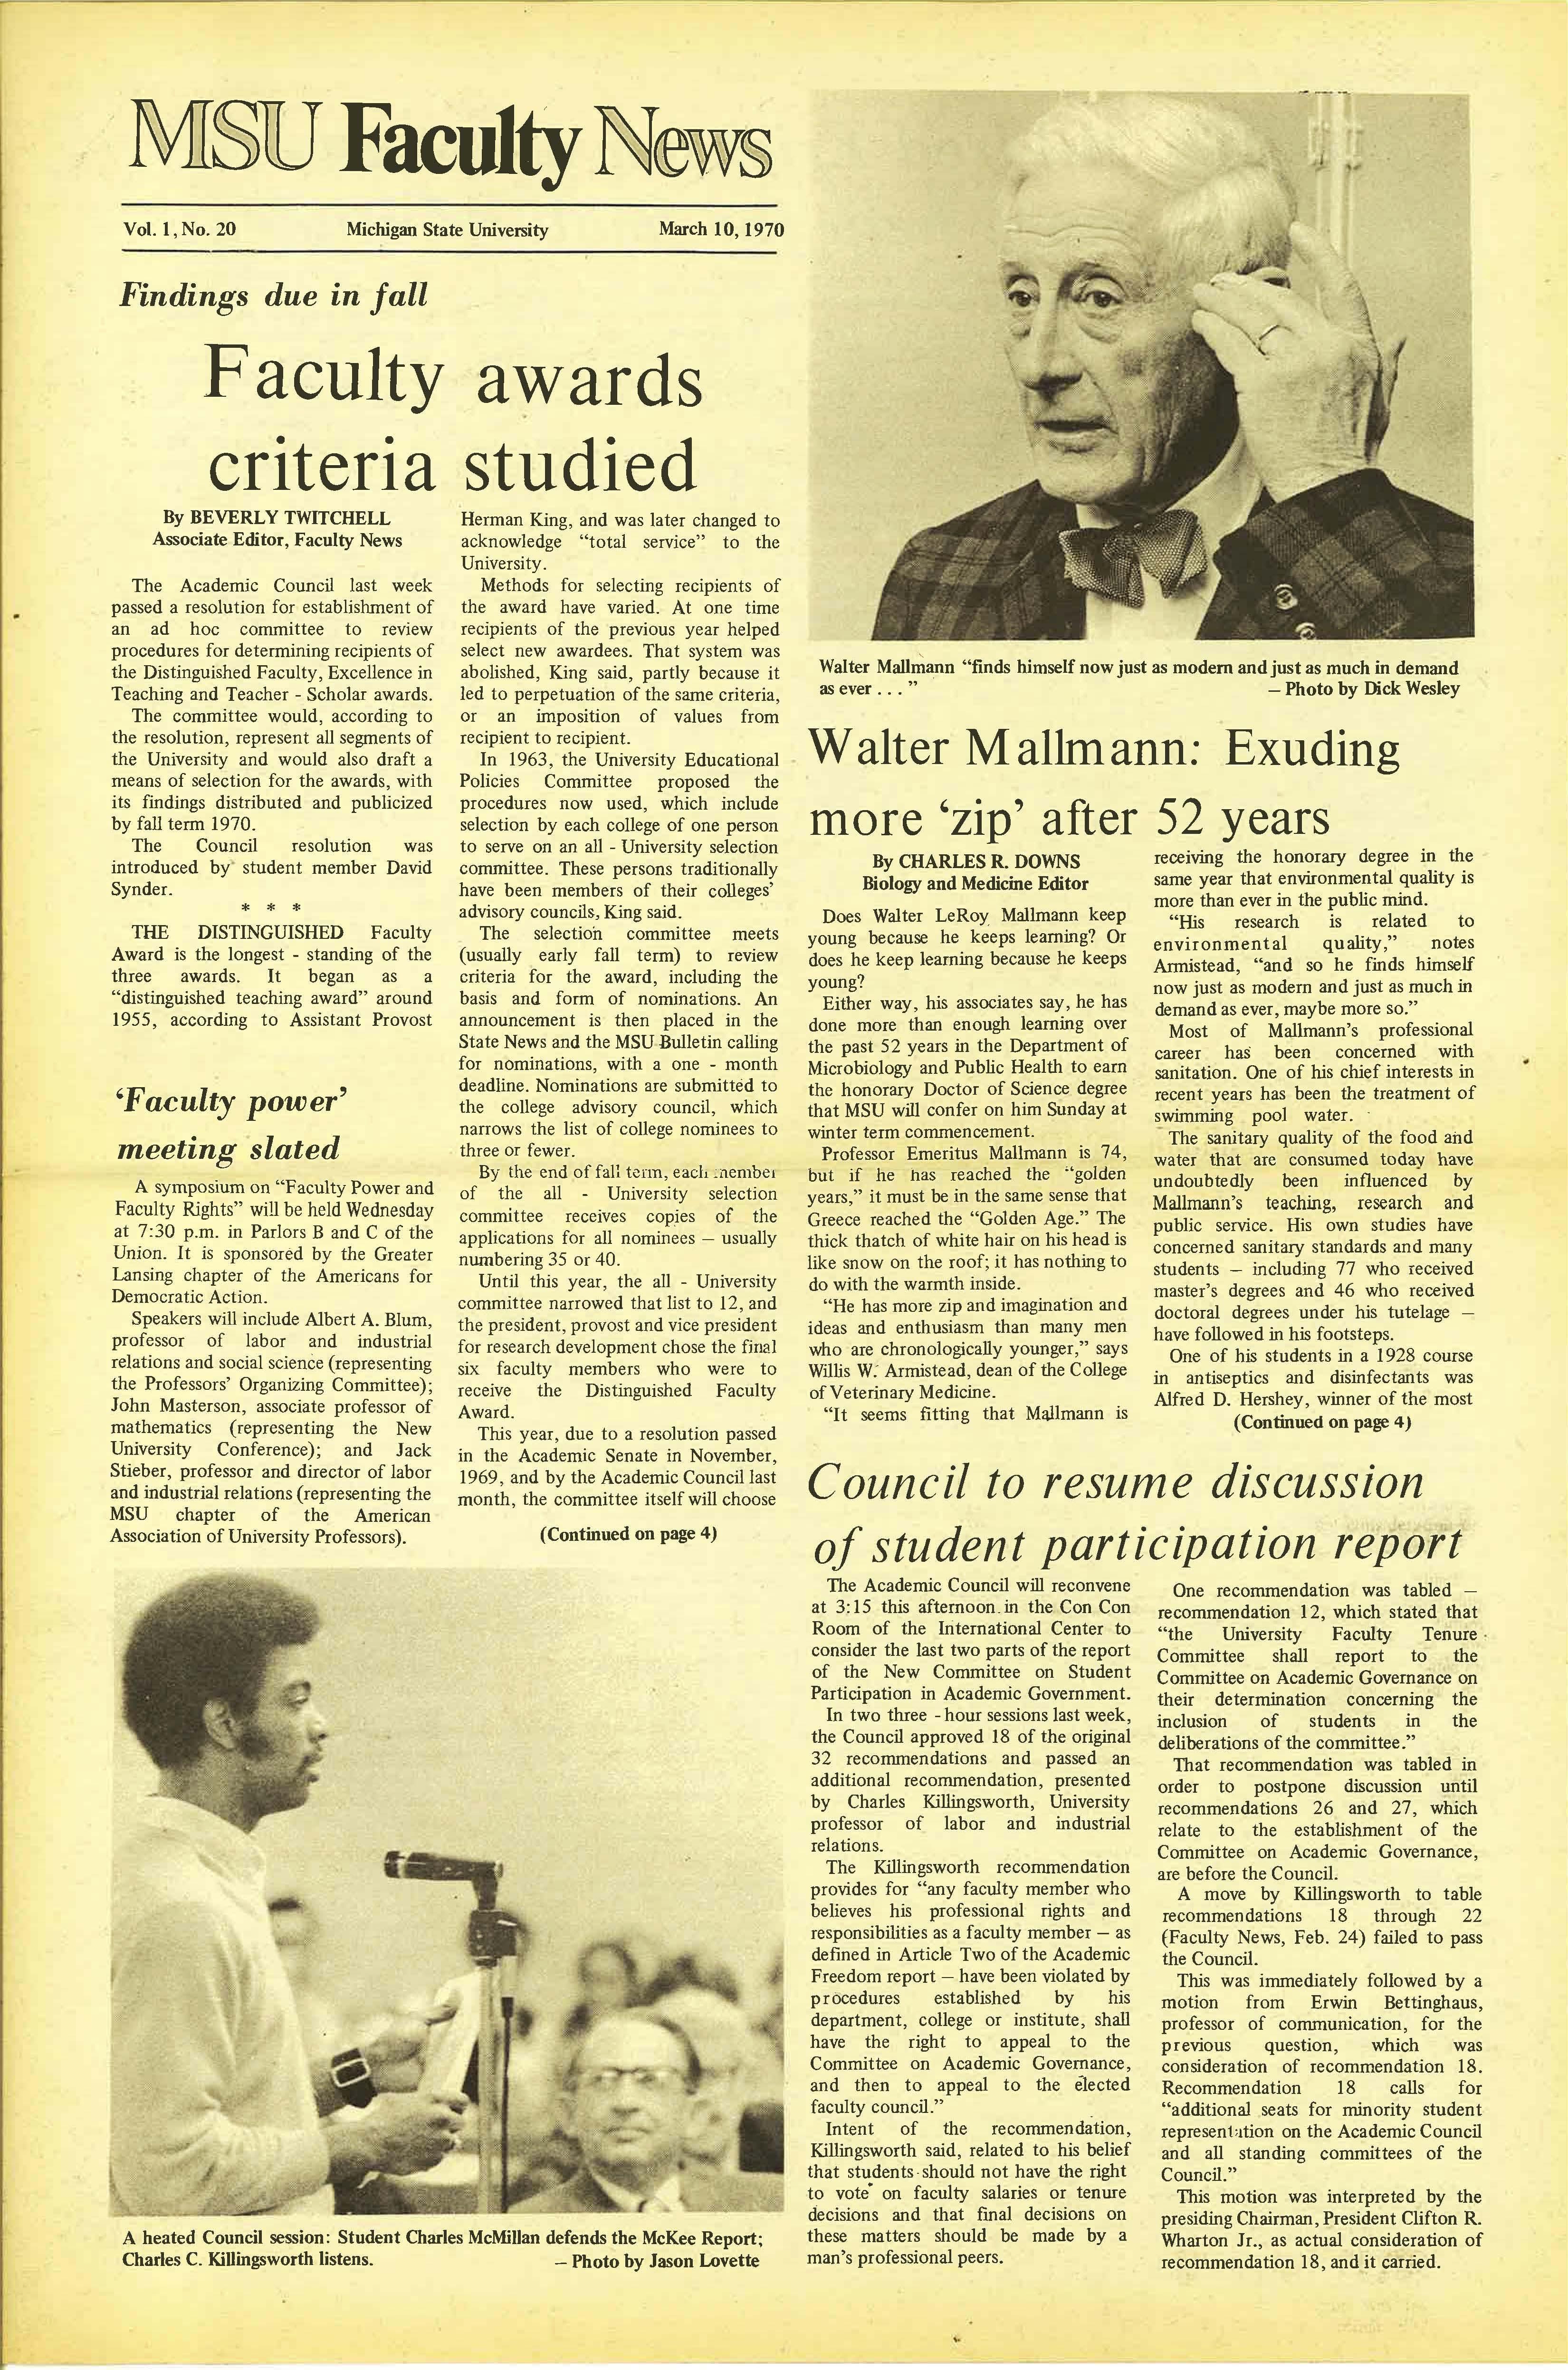 MSU News Bulletin, Vol. 1, No. 32, July 14, 1970